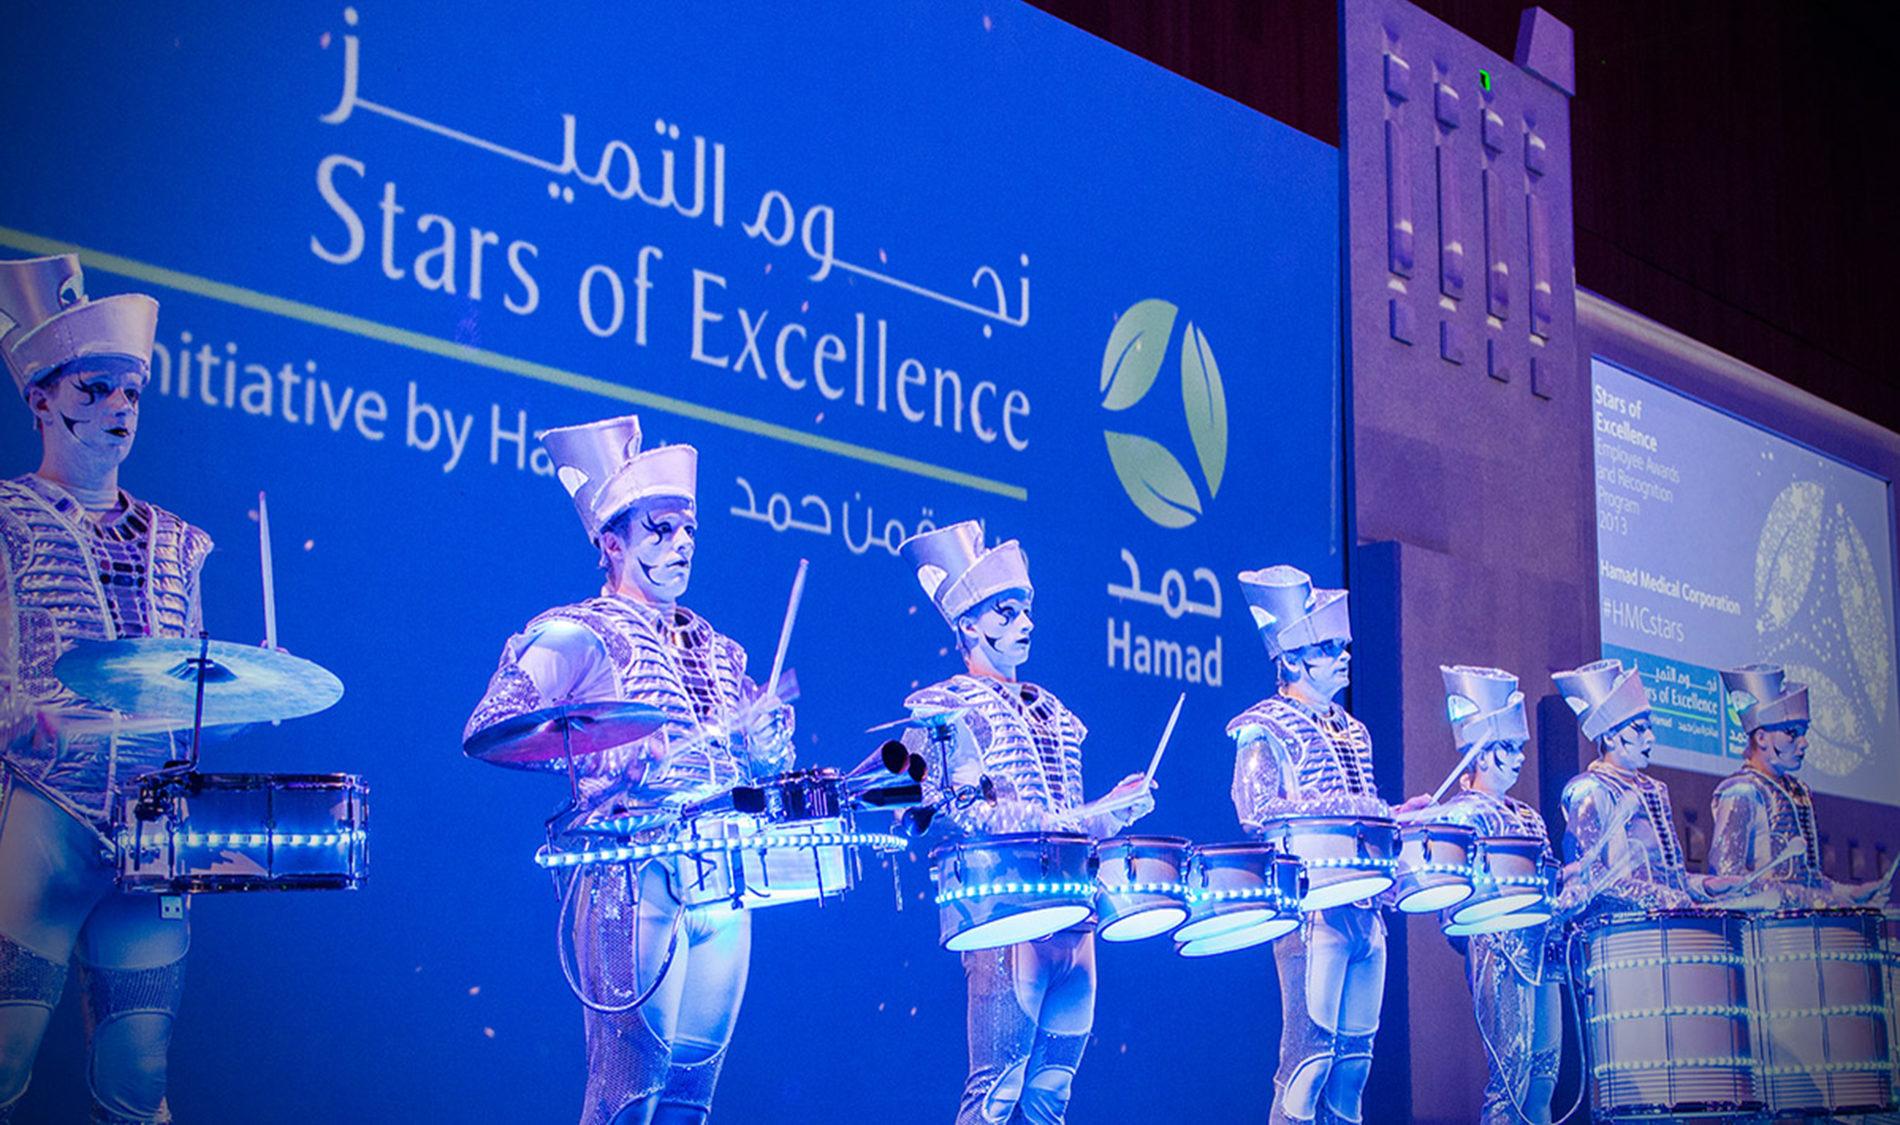 HMC, STARS OF EXCELLENCE